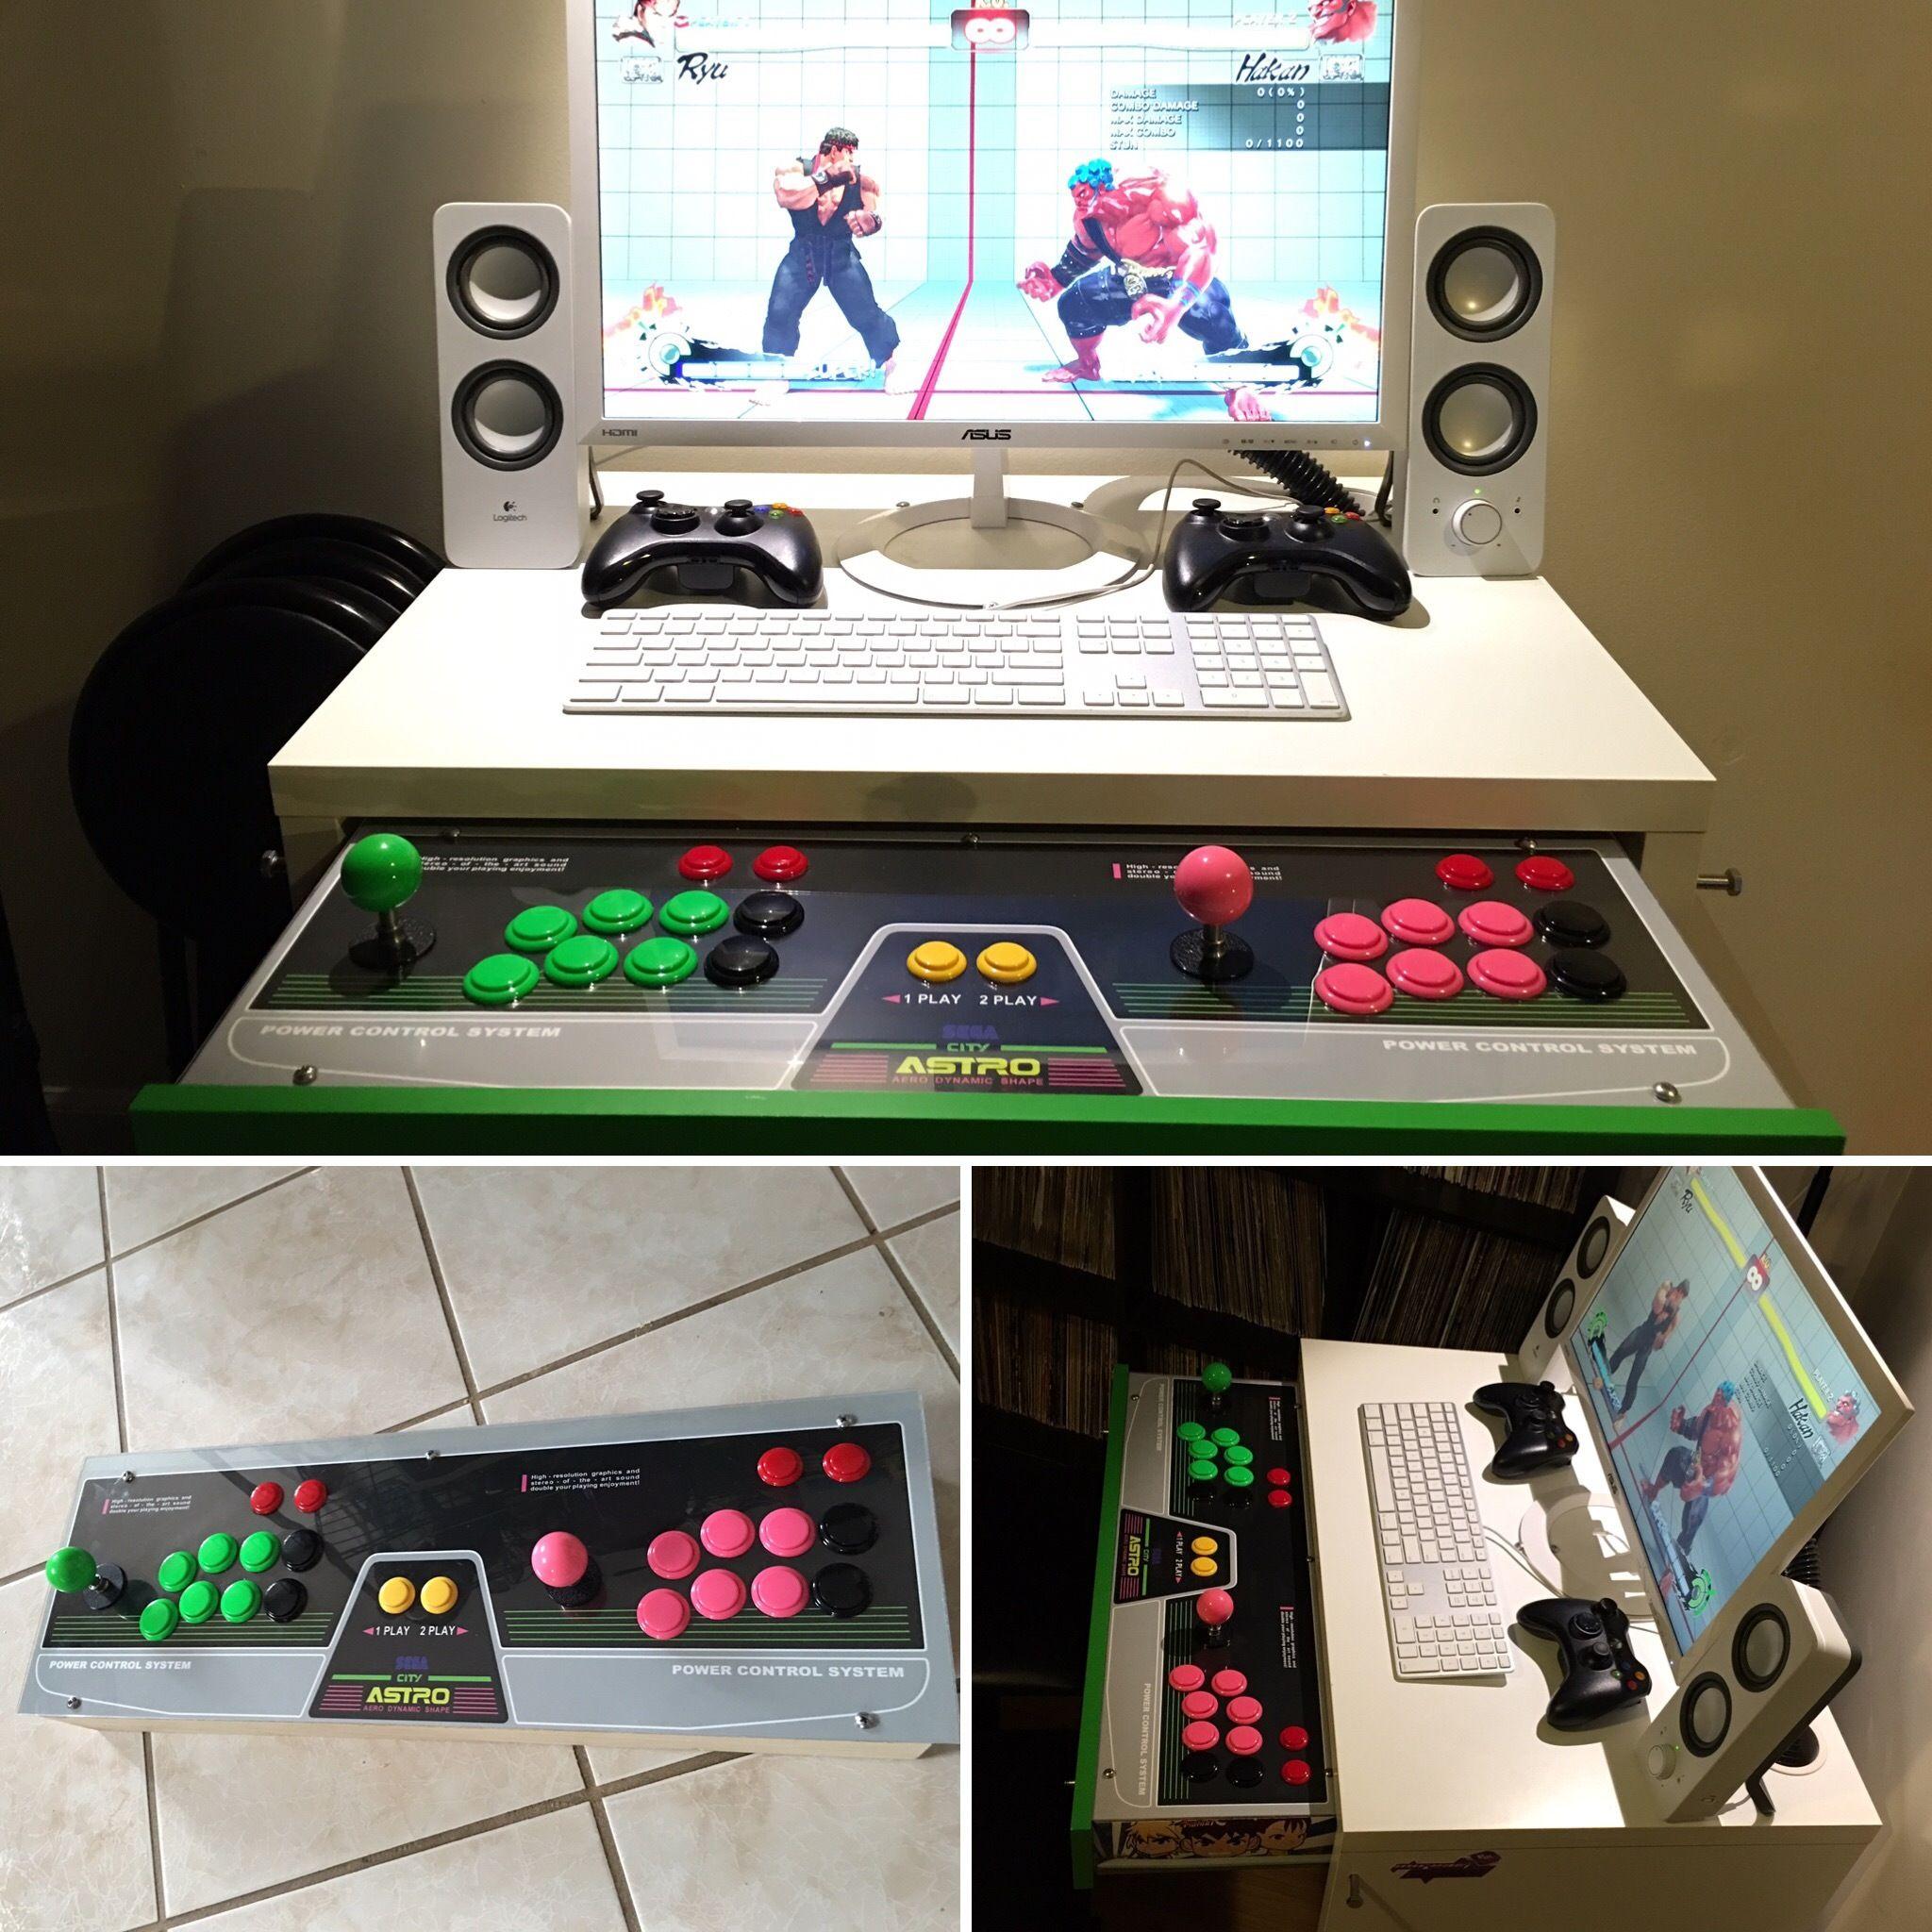 Art4ms Drawer Stick Diy Arcade Cabinet Micke Desk Ikea Micke [ 2048 x 2048 Pixel ]